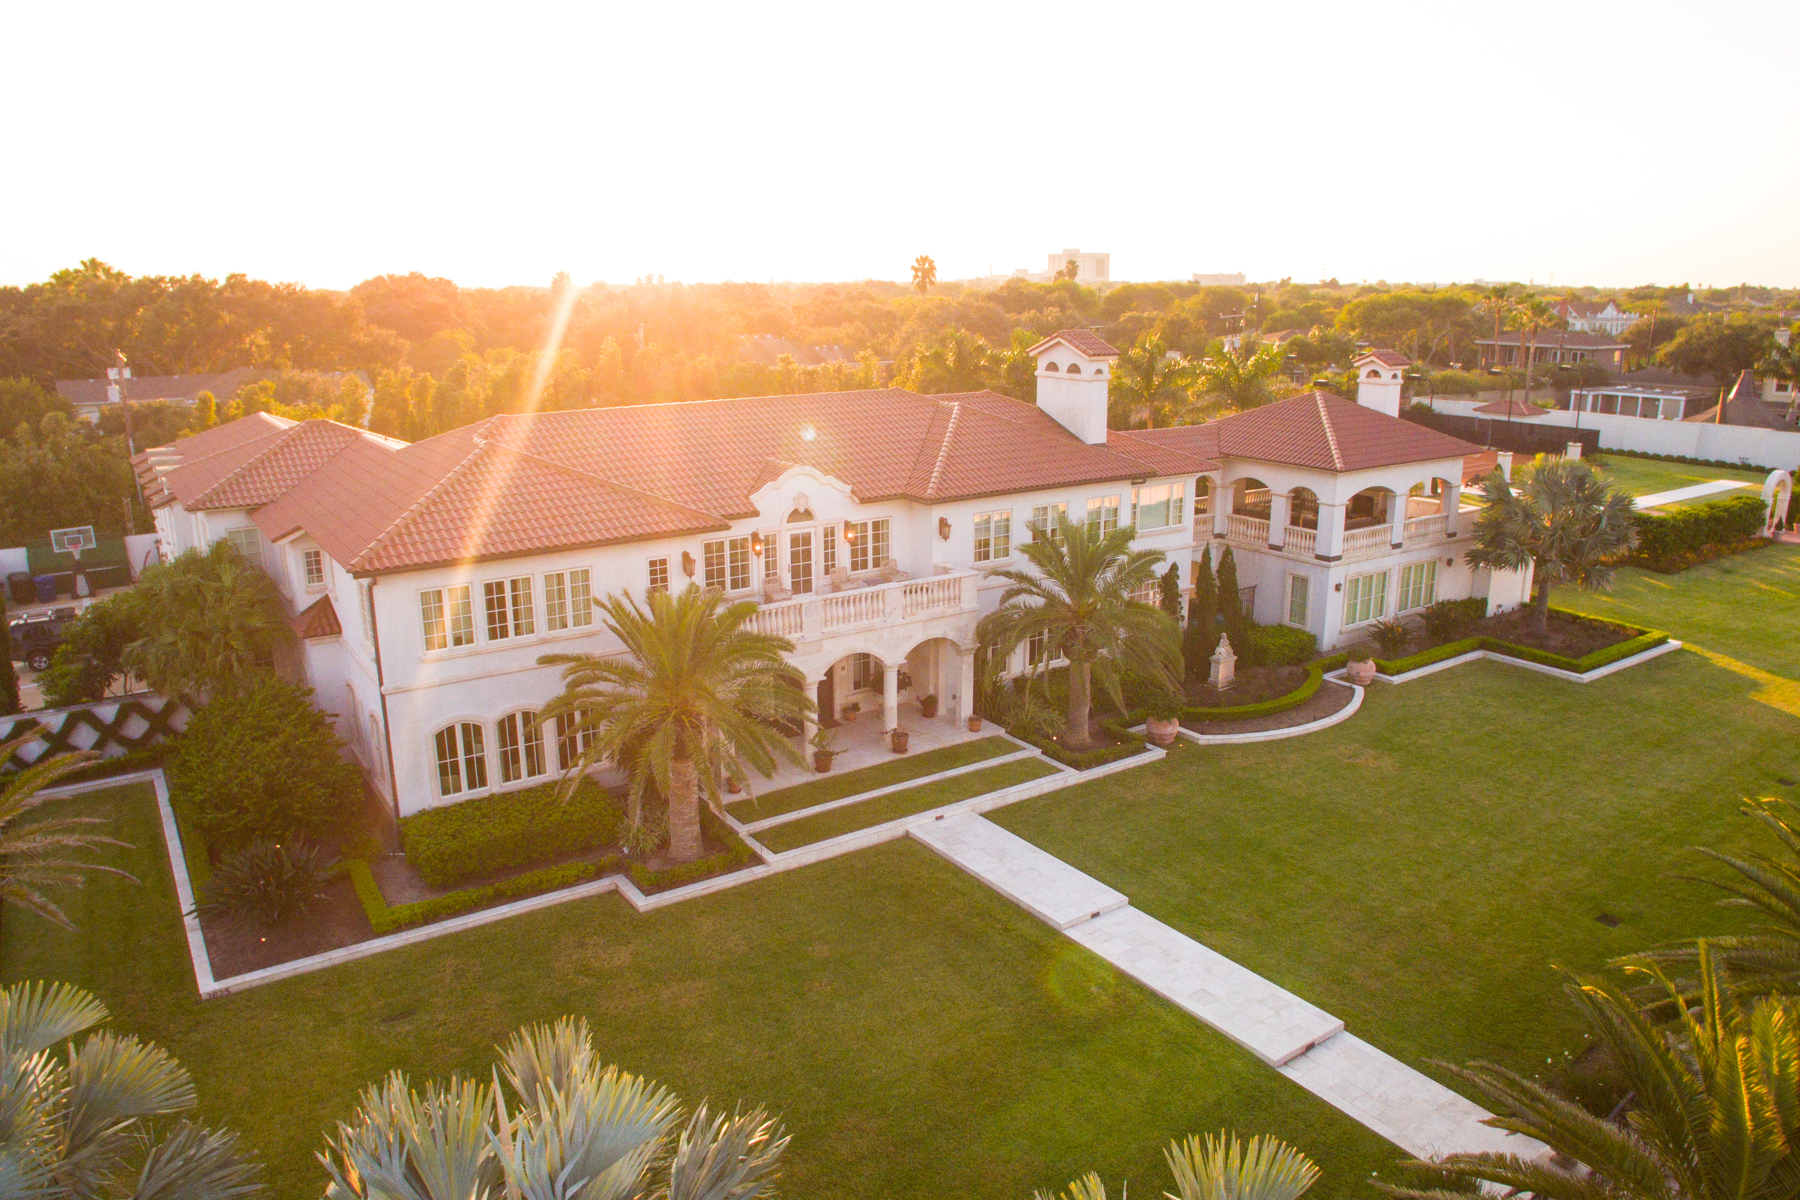 Casa Unifamiliar por un Venta en Iconic Corpus Christi Ocean Drive Estate 3825 Ocean Dr Corpus Christi, Texas 78411 Estados Unidos